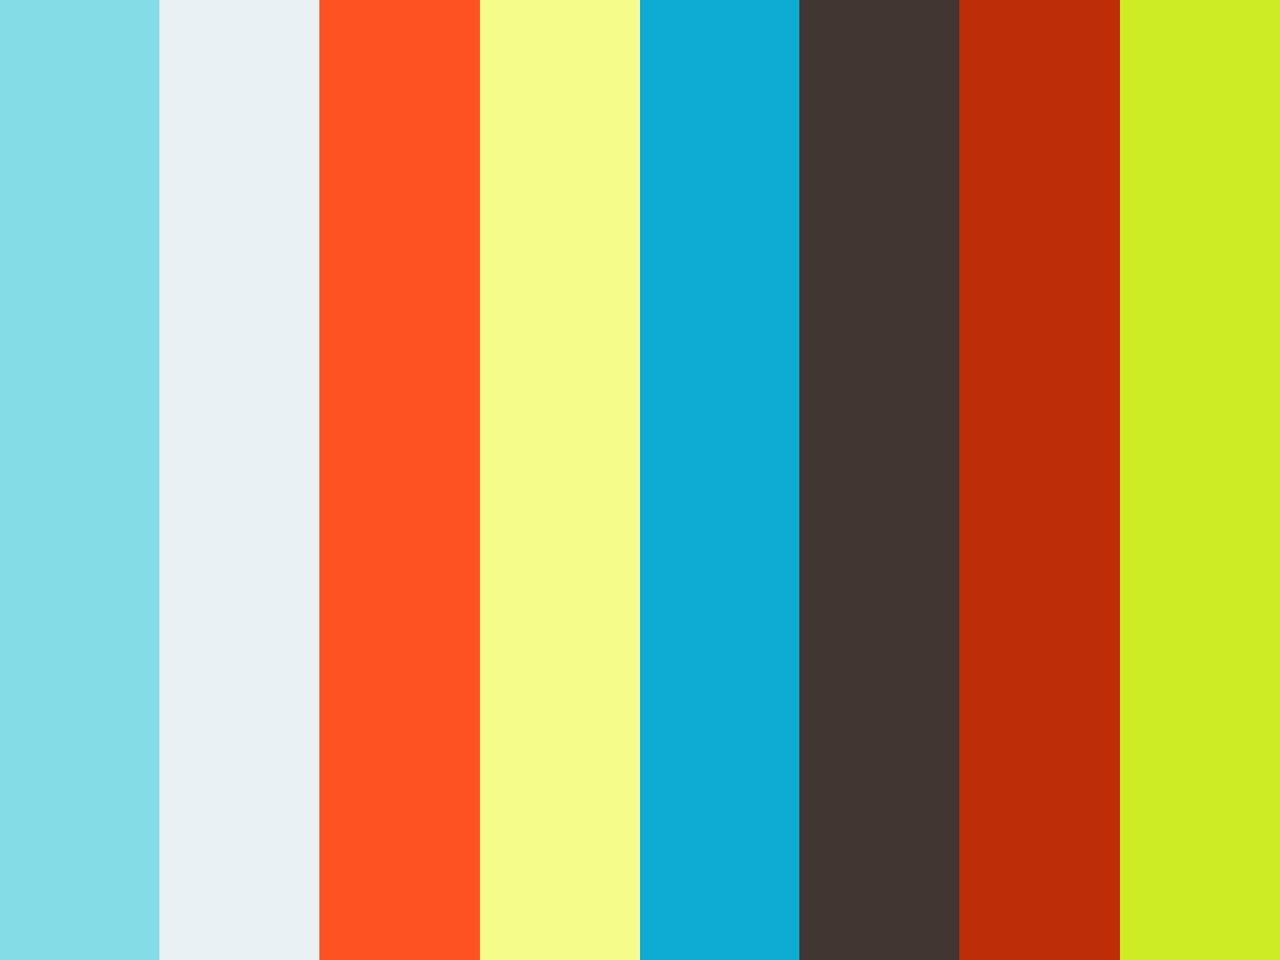 nhkl 114 roller rintoo 22 min animatic on vimeo